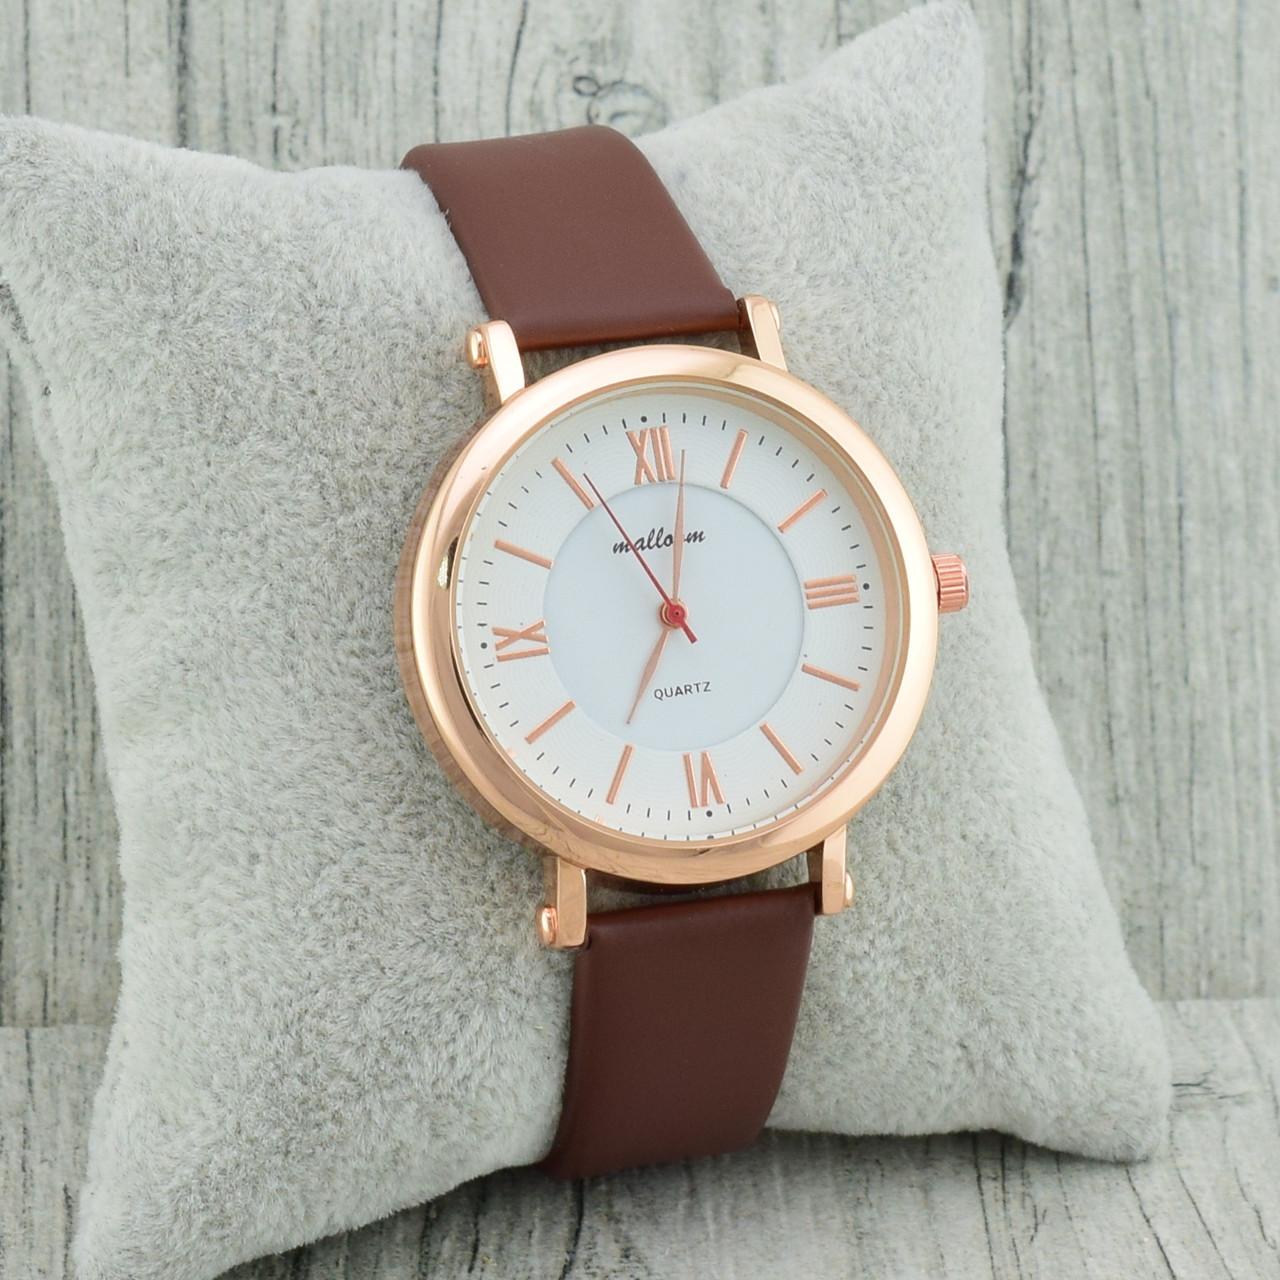 Часы G-083 диаметр циферблата 3.2 см, длина ремешка 16-21 см, коричневый цвет, позолота РО